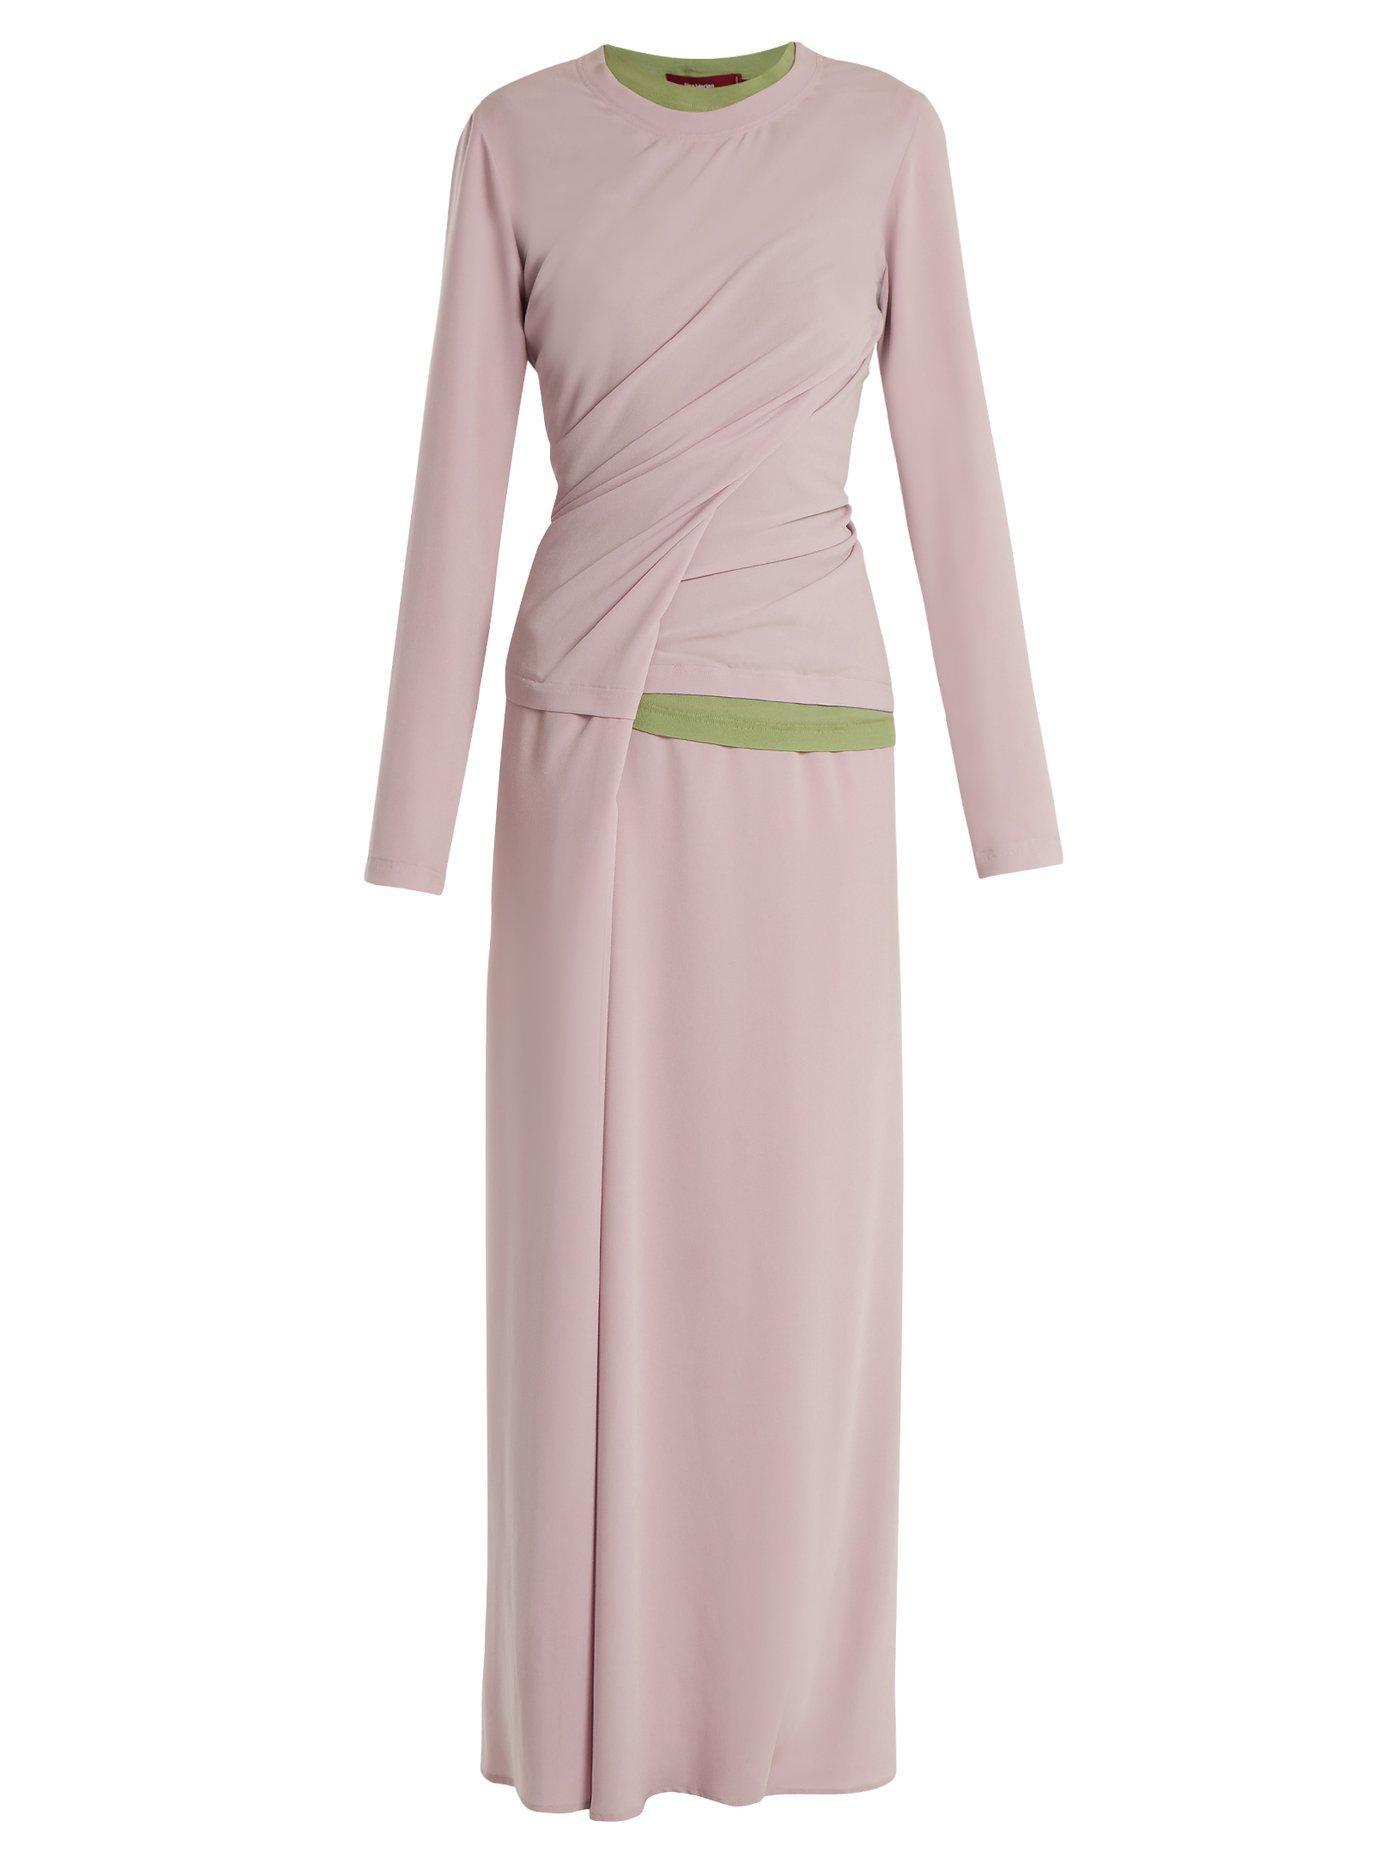 Vivki twisted two-tone dress Sies Marjan Cheap Sale Real Ofowd